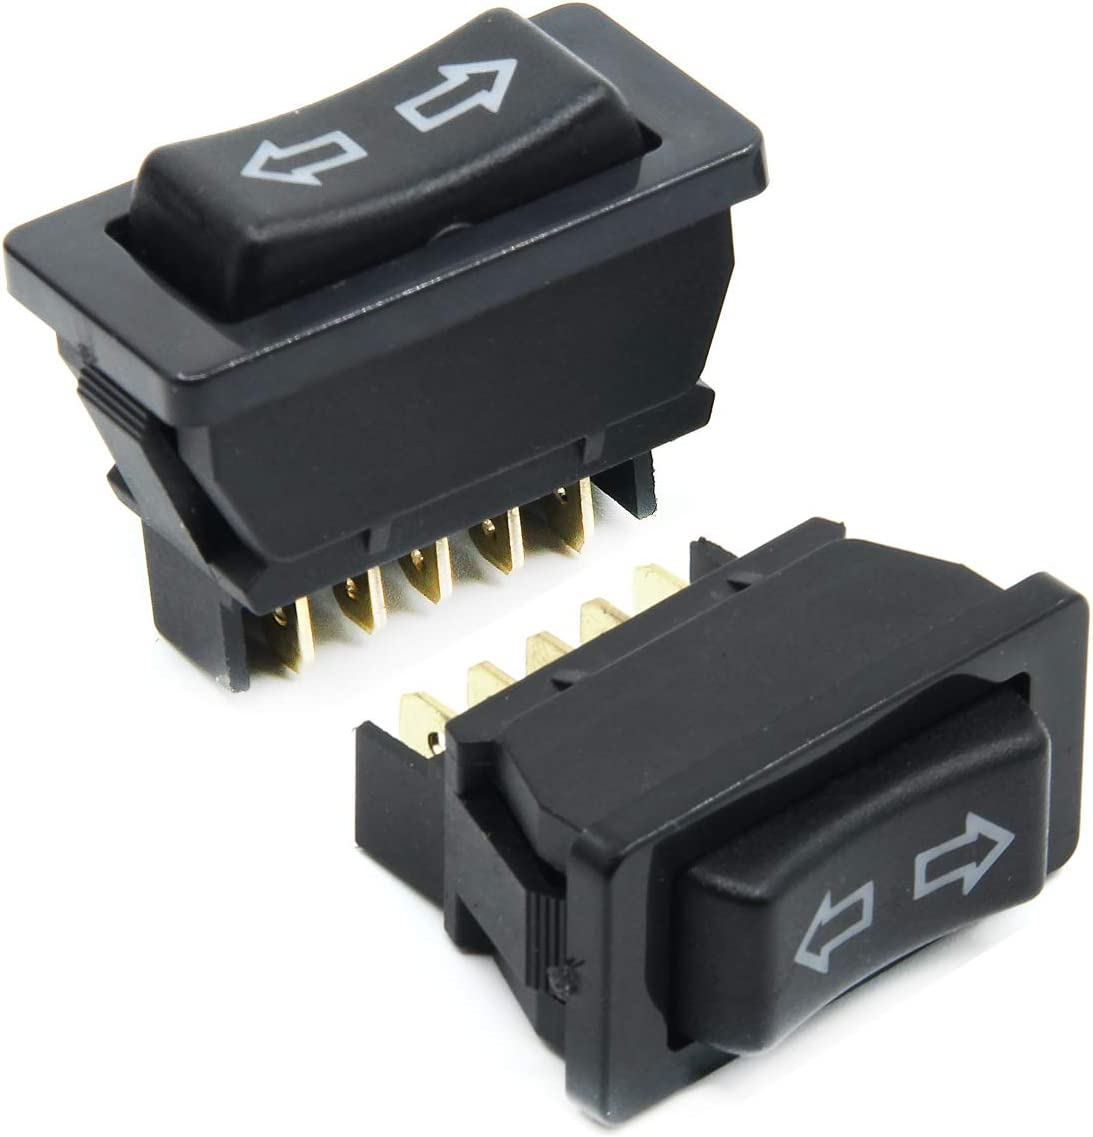 Forwin Parts Climate Control Push Button Set for BMW E39 528i 530i 540i M5 E53 X5 64118375645